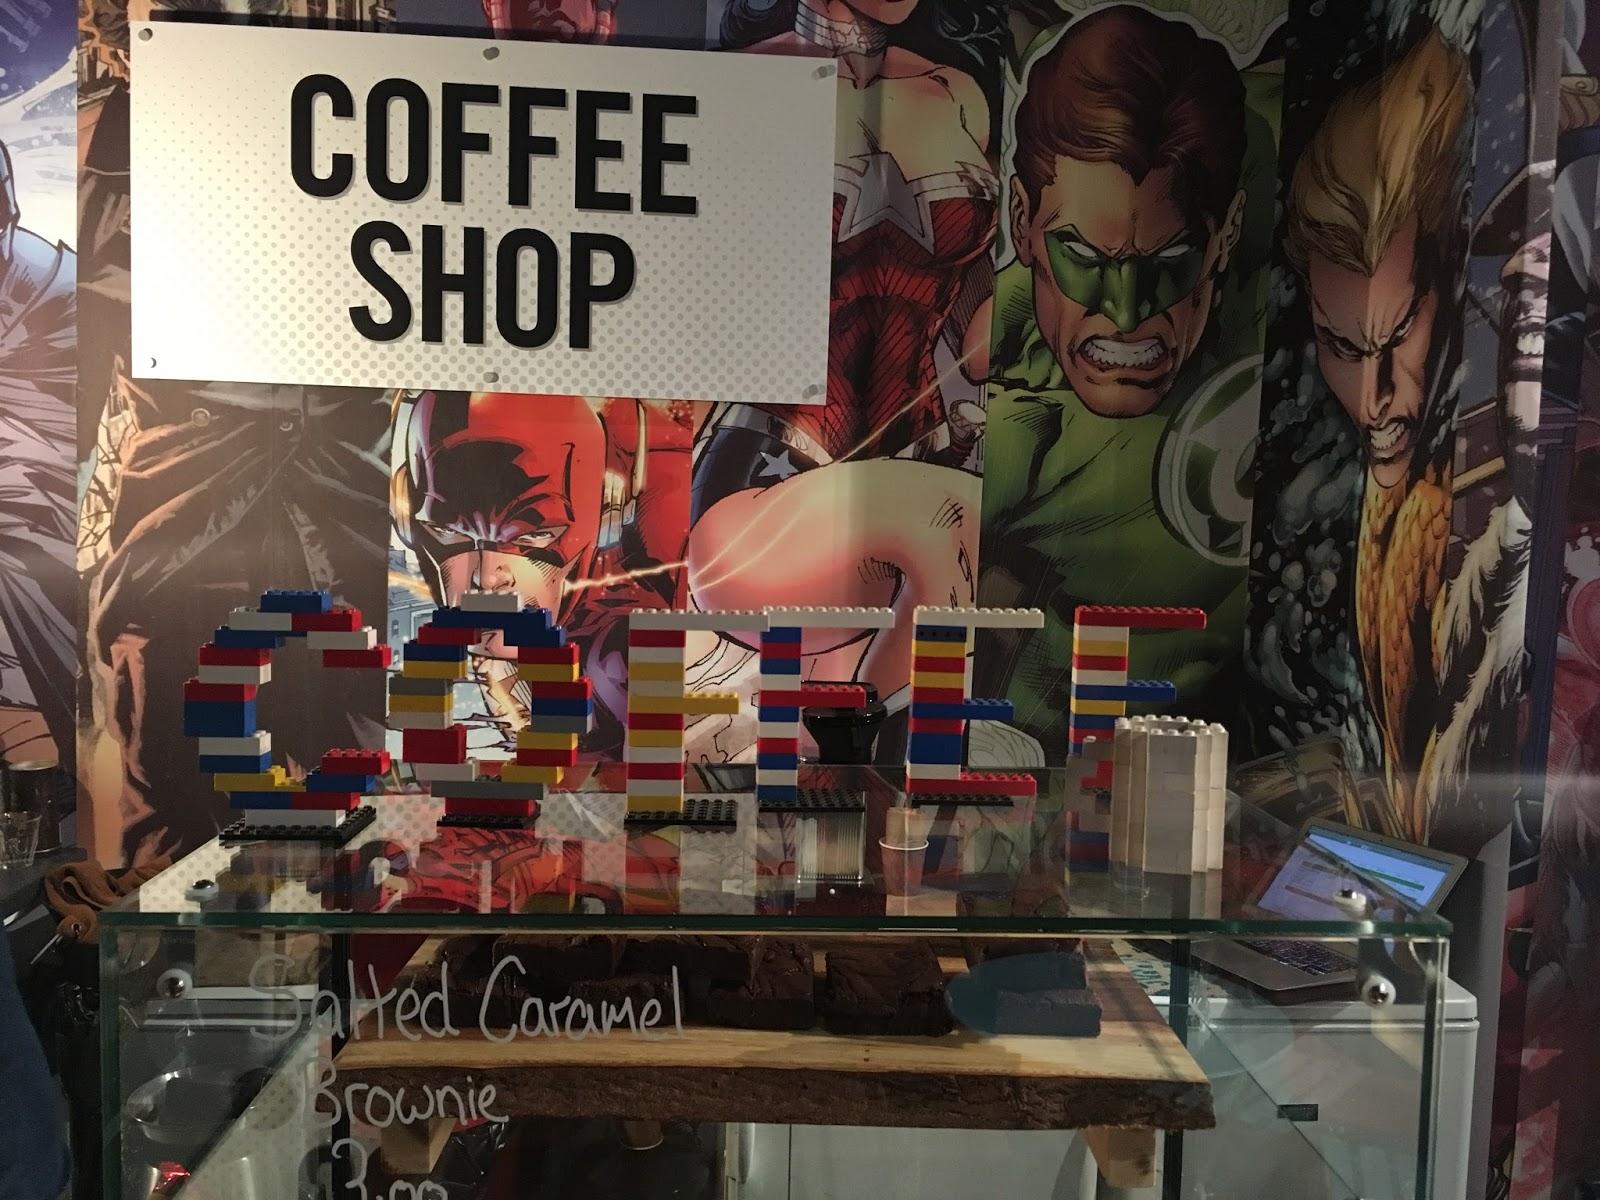 DC coffee shop sign